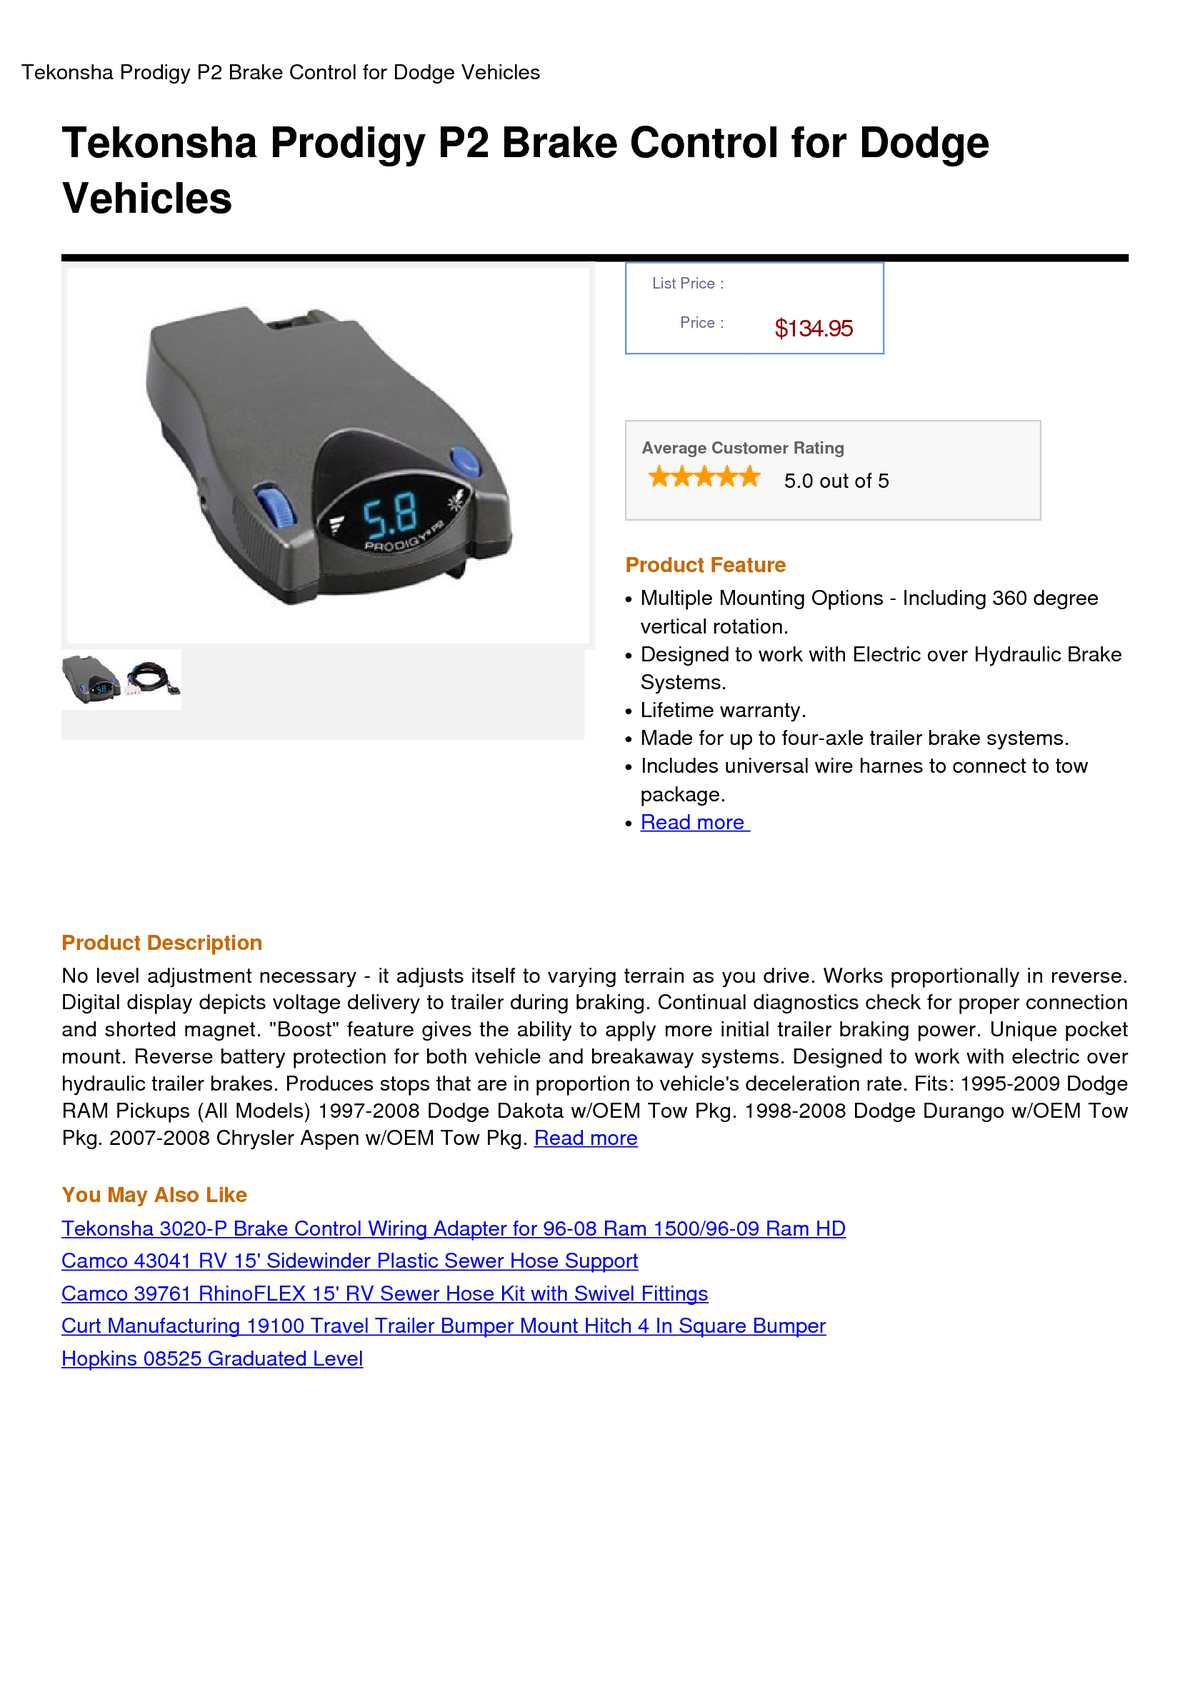 Calamo Tekonsha Prodigy P2 Brake Control For Dodge Vehicles Trailer Mounted Electronic Controller Wiring